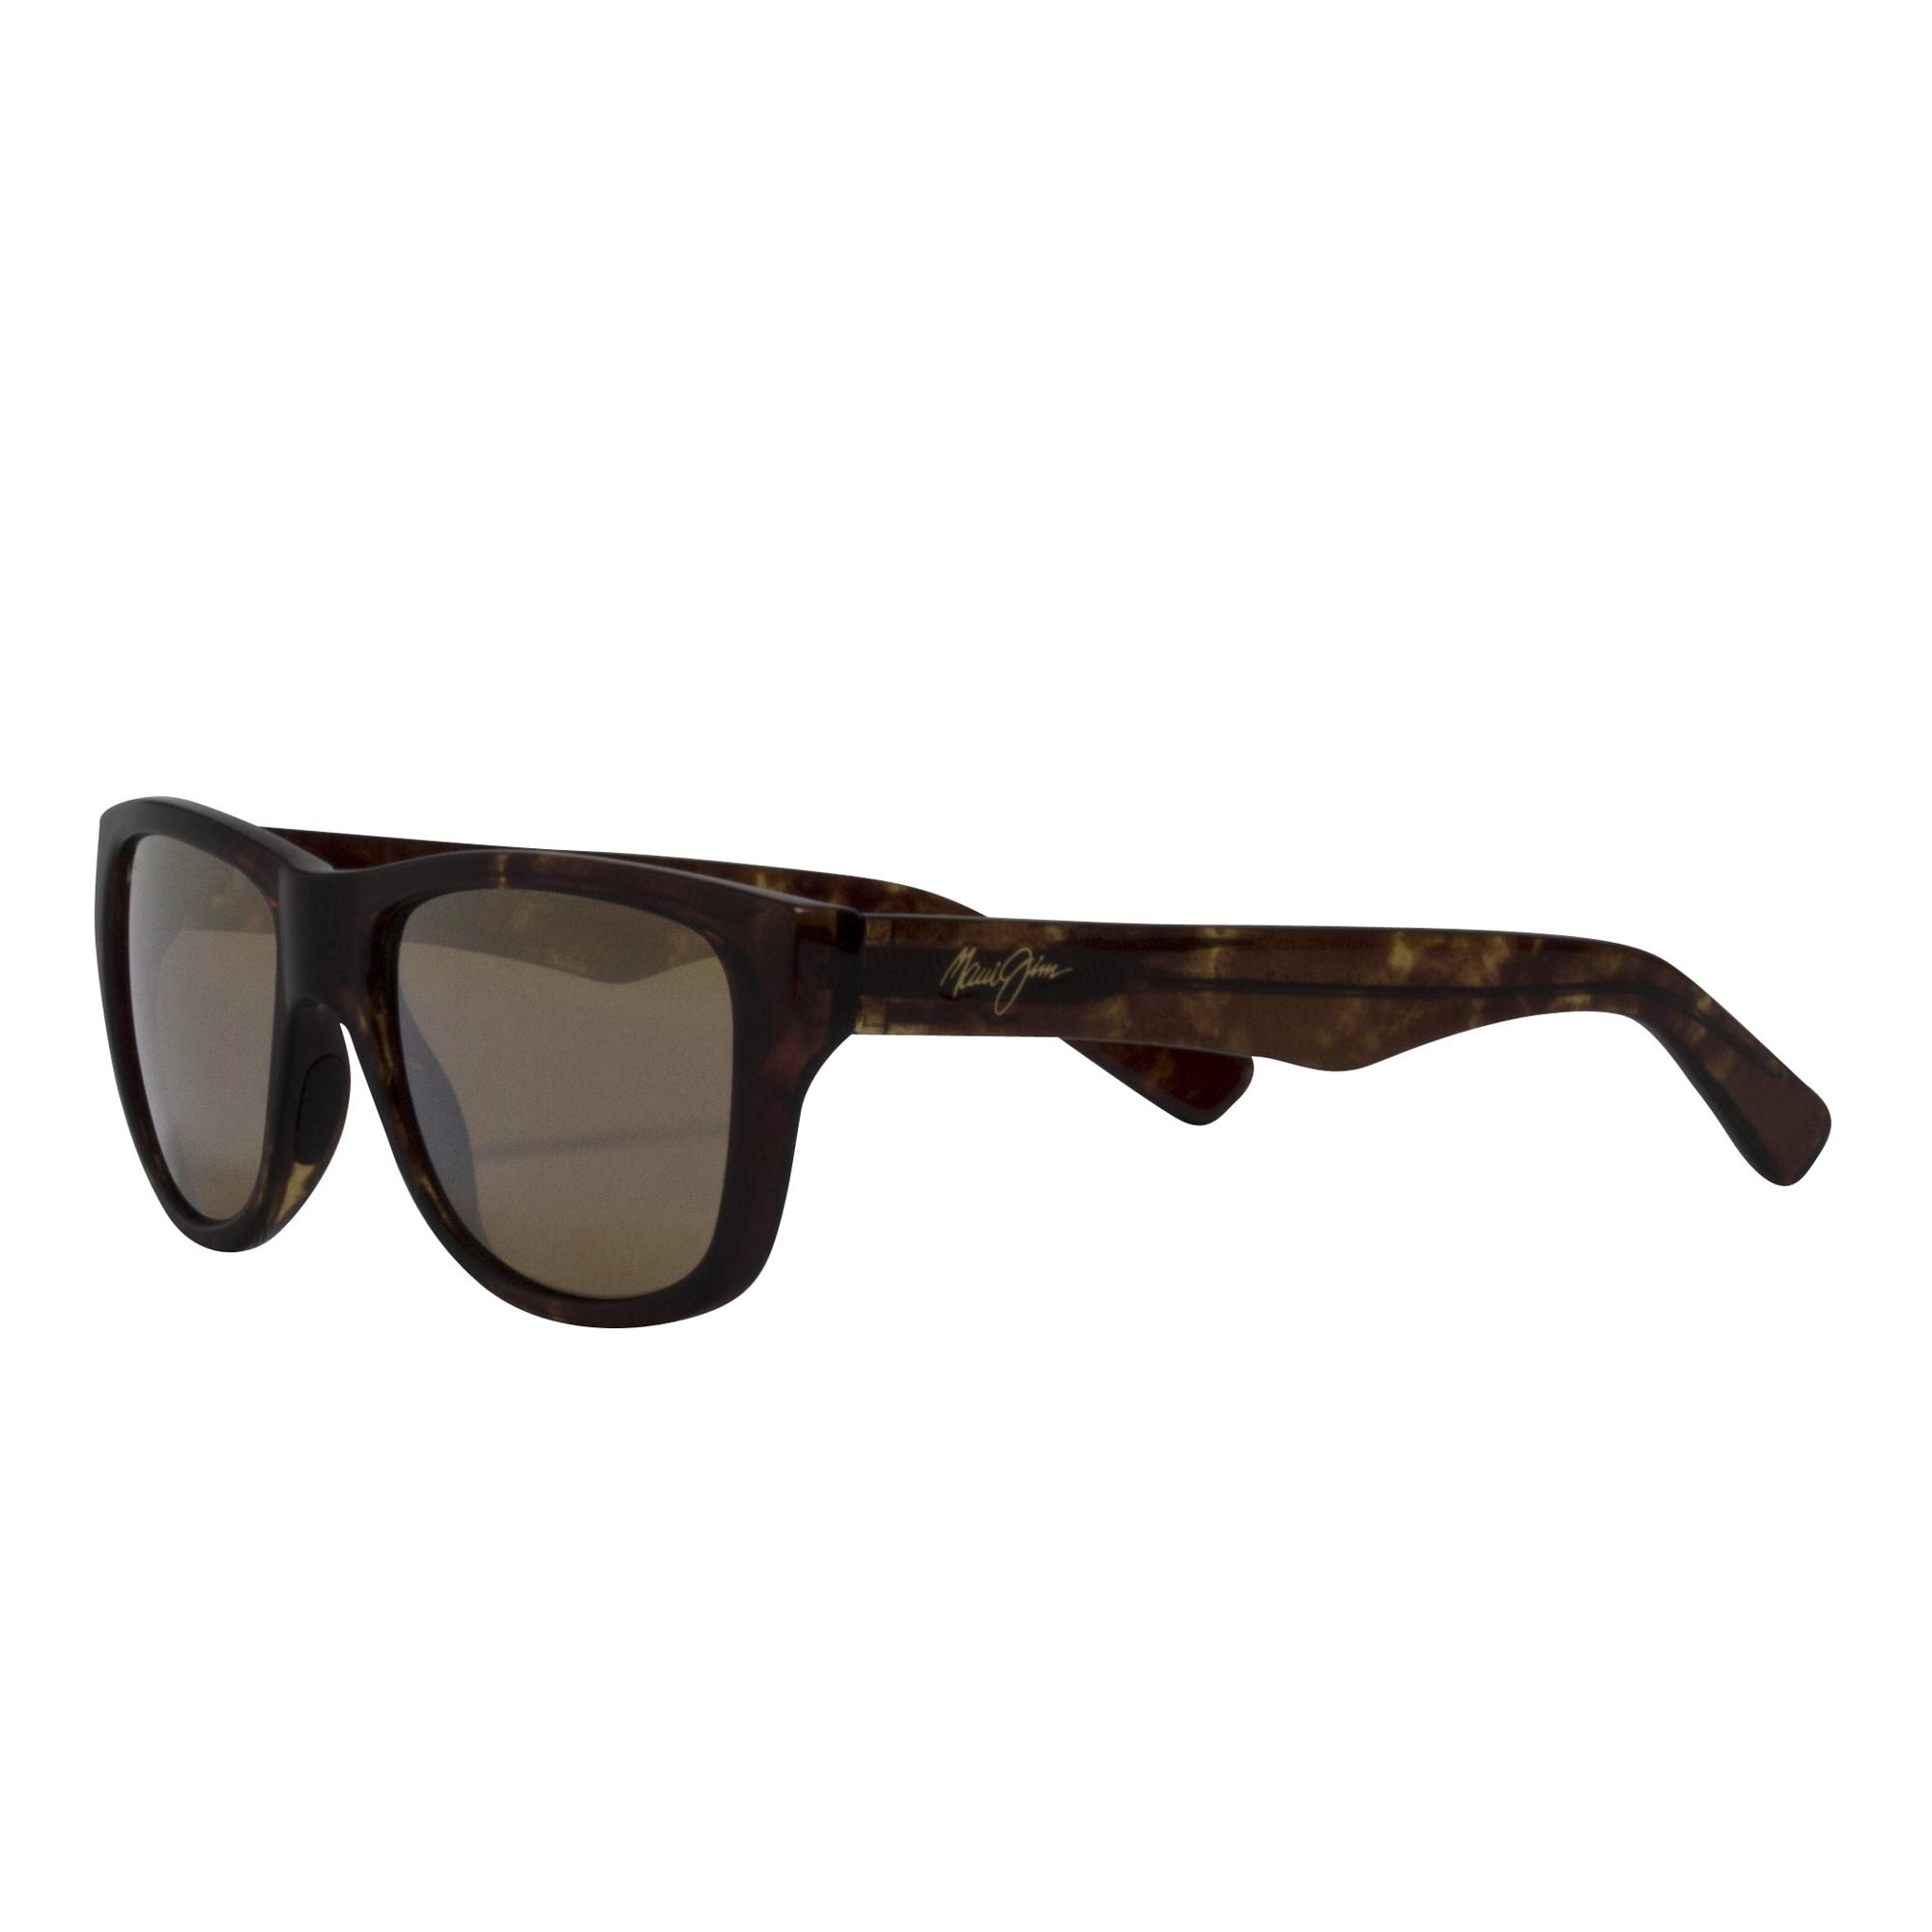 681bf0552ff9 Shop Maui Jim Unisex 'Maui Cat III' Tortoise Full-frame Polarized Sunglasses  - Free Shipping Today - Overstock - 9332006